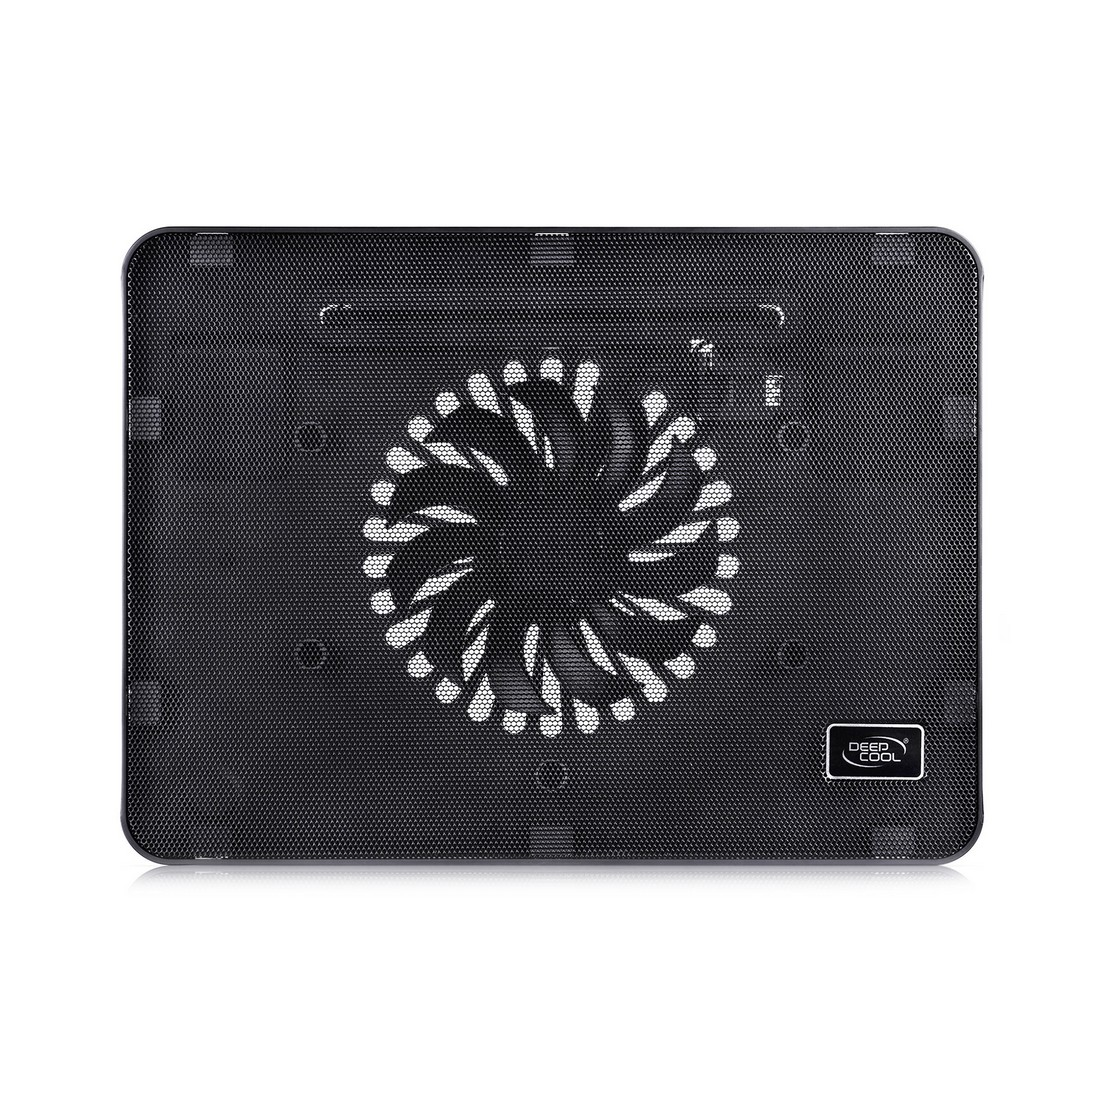 "Охлаждающая подставка для ноутбука Deepcool WIND PAL MINI 15 ,6"""